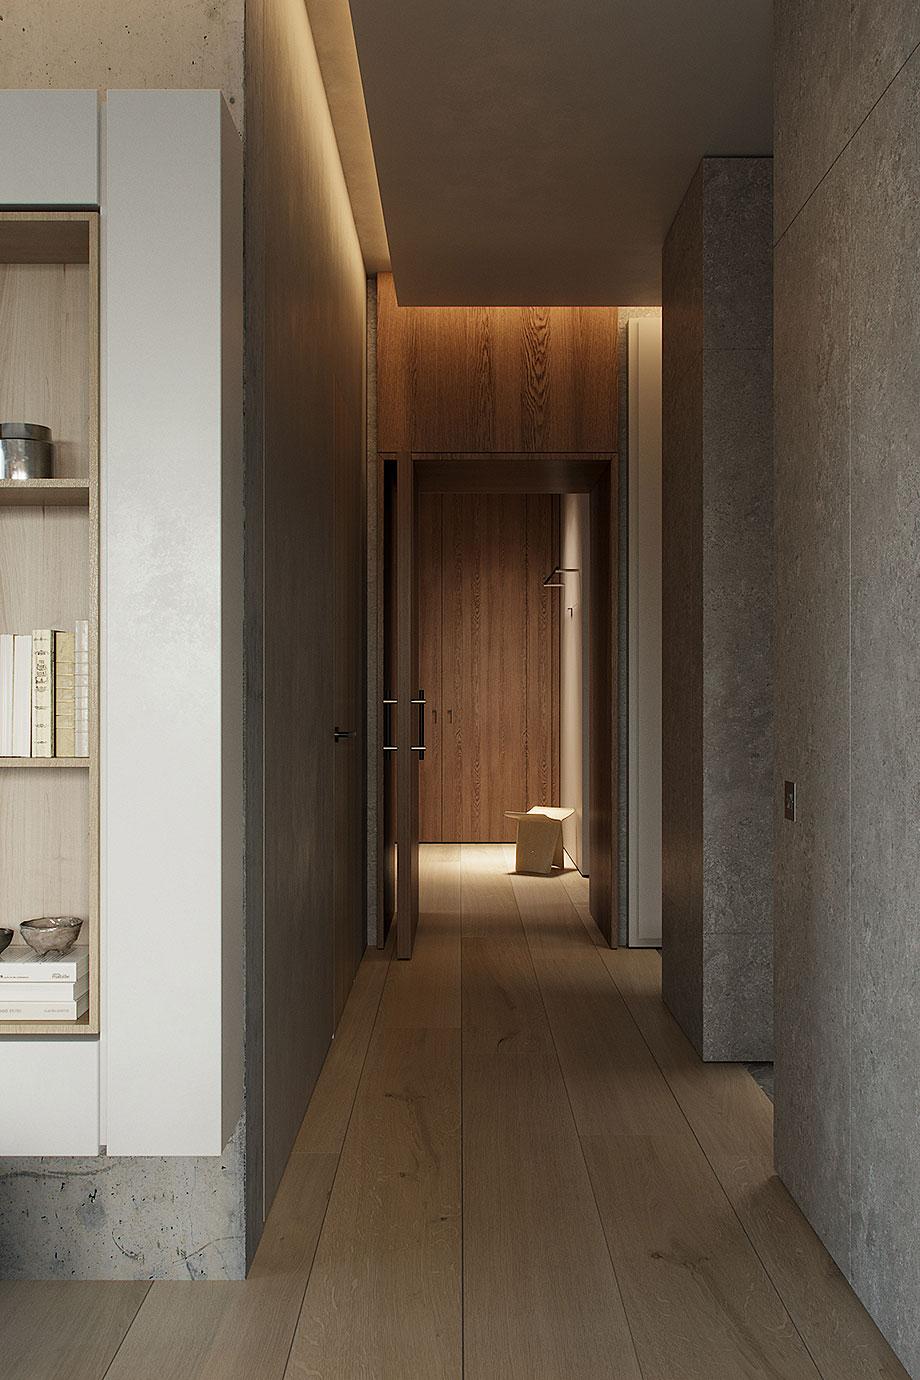 apartamento en moscu de kodd bureau (7) - foto daria koloskova